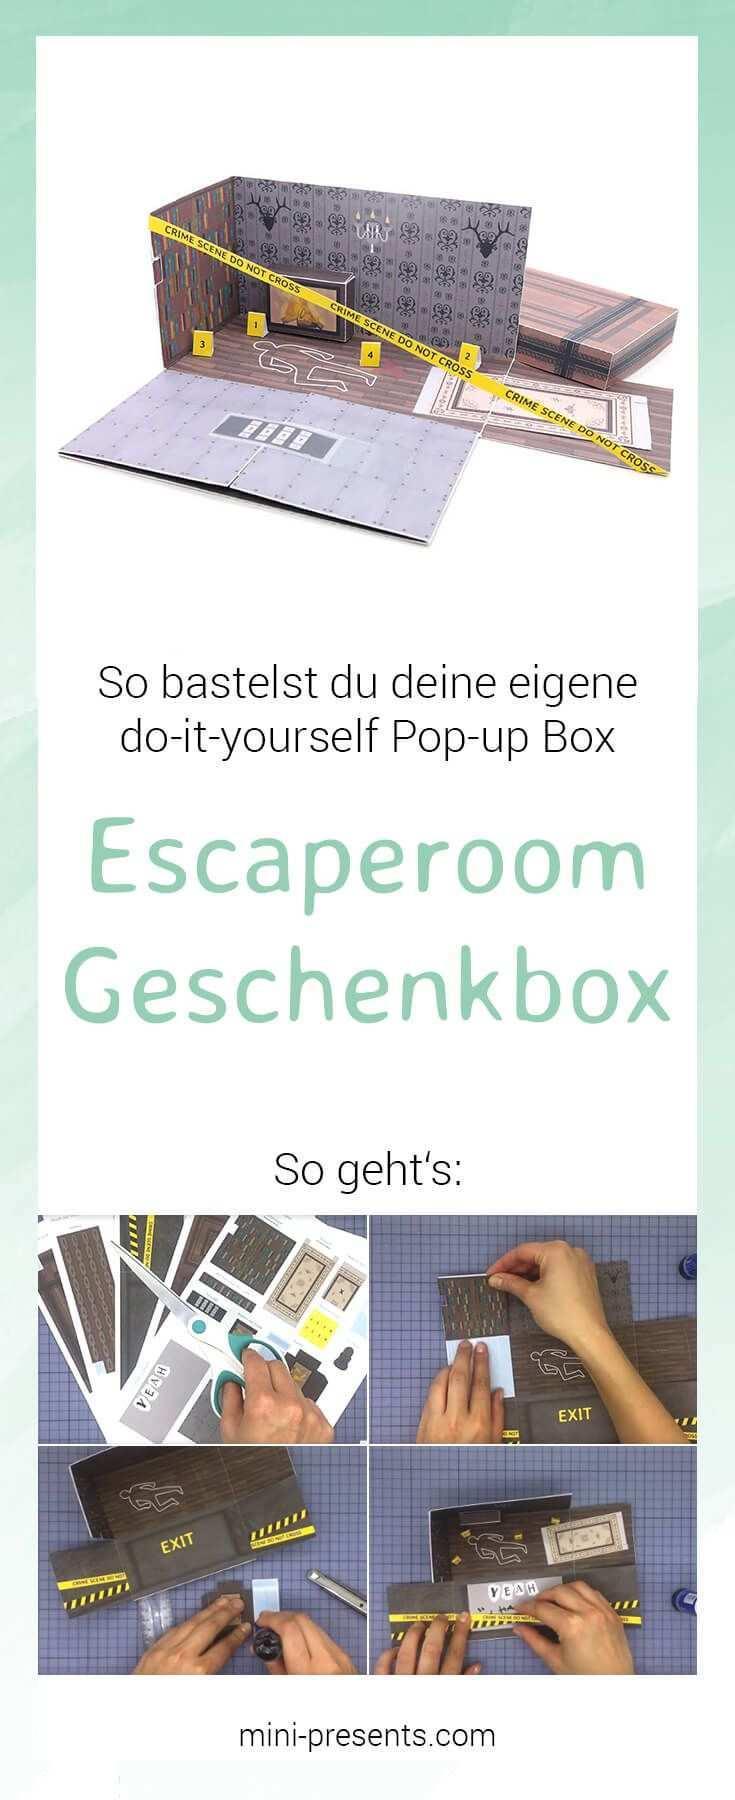 Do It Yourself Escape Room Geschenkbox Als Gutschein Mini Presents Blog Do It Yourself Geschenke Geschenke Geschenkbox